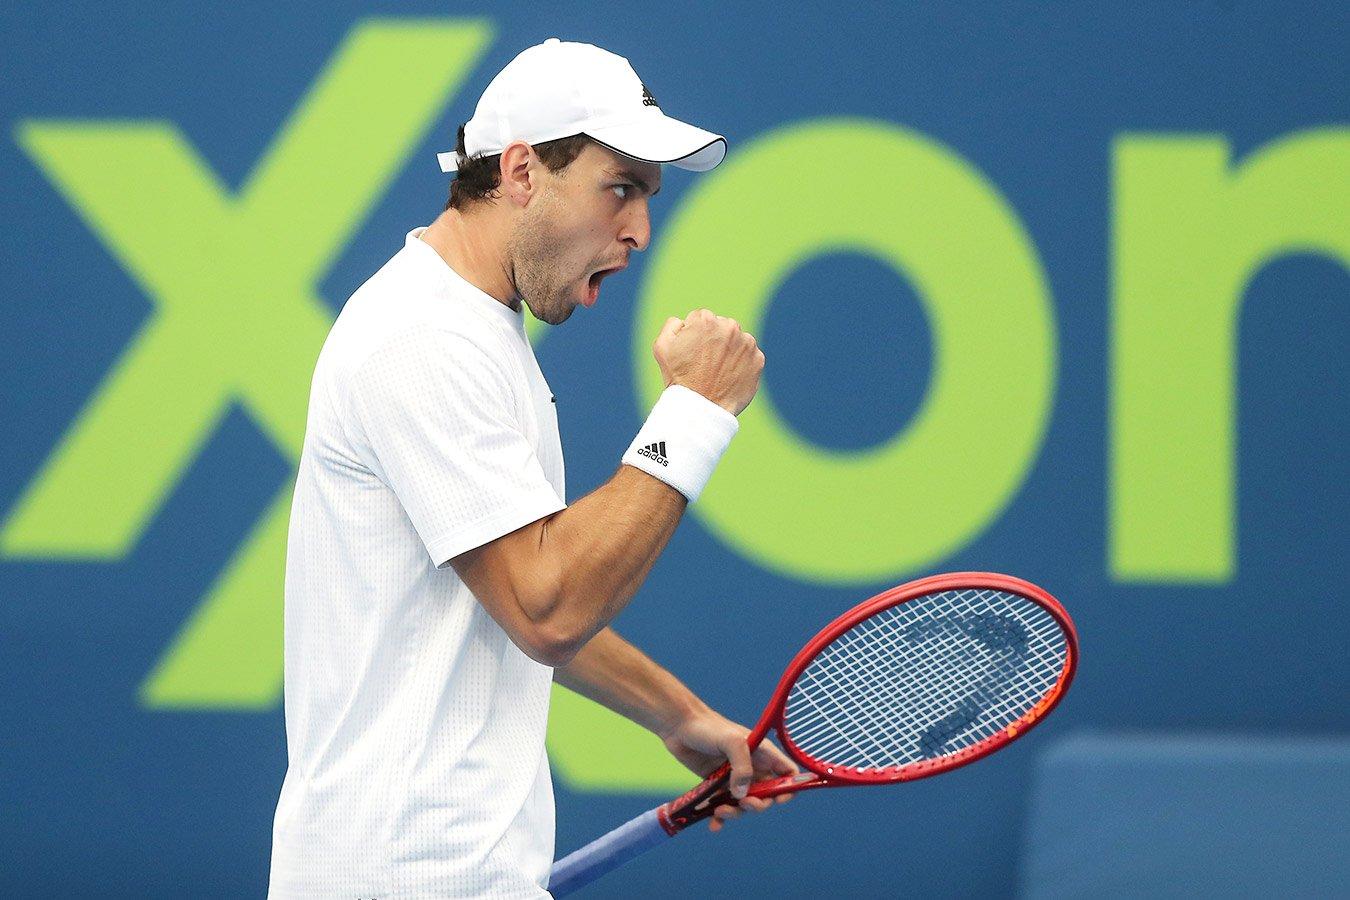 Аслан Карацев победил Даниила Медведева во втором круге «Мастерса» в Риме